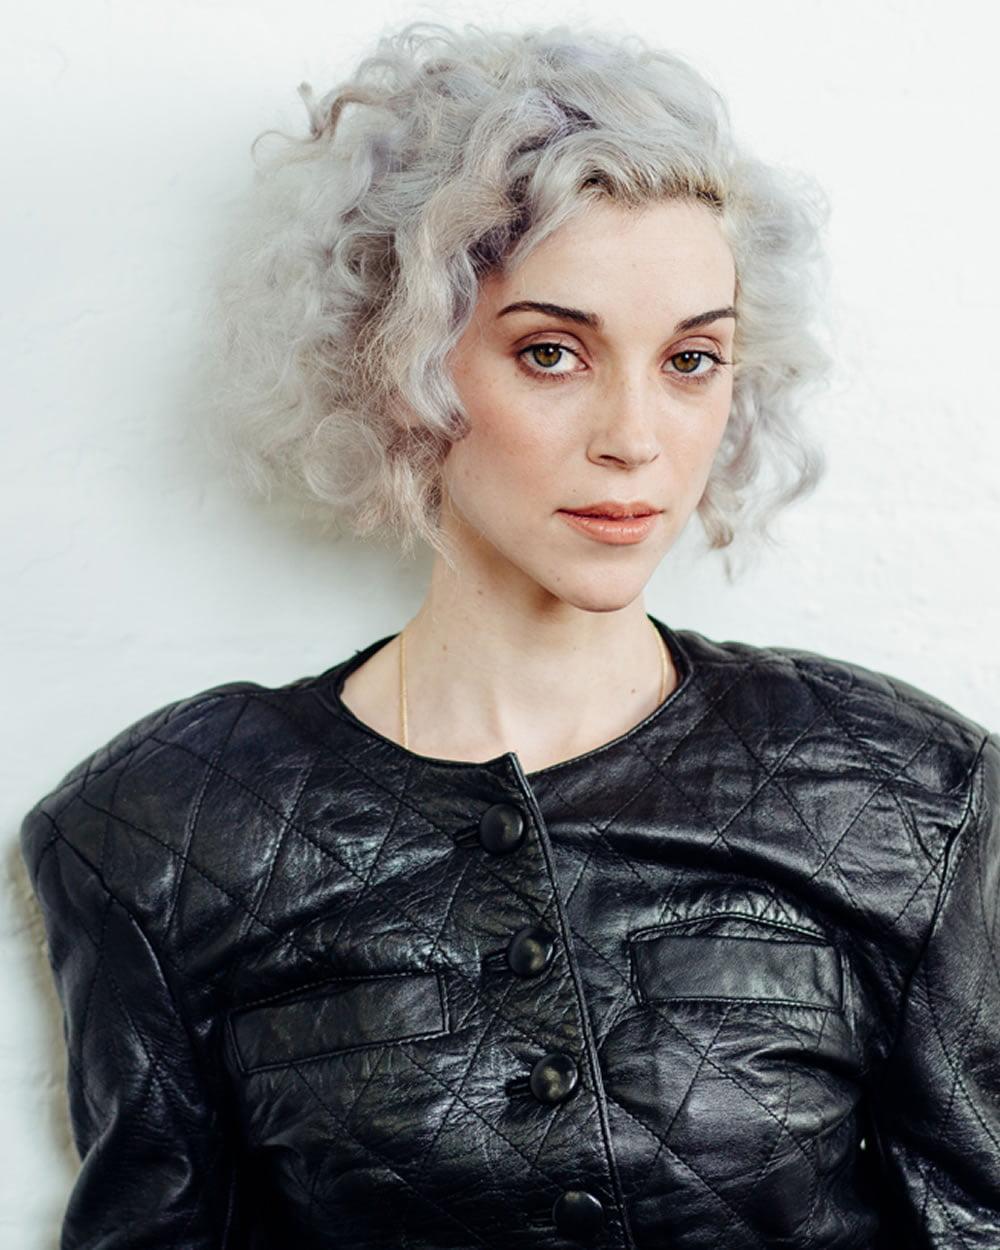 Gray Short Curly Hair Style 2019 Hair Colors